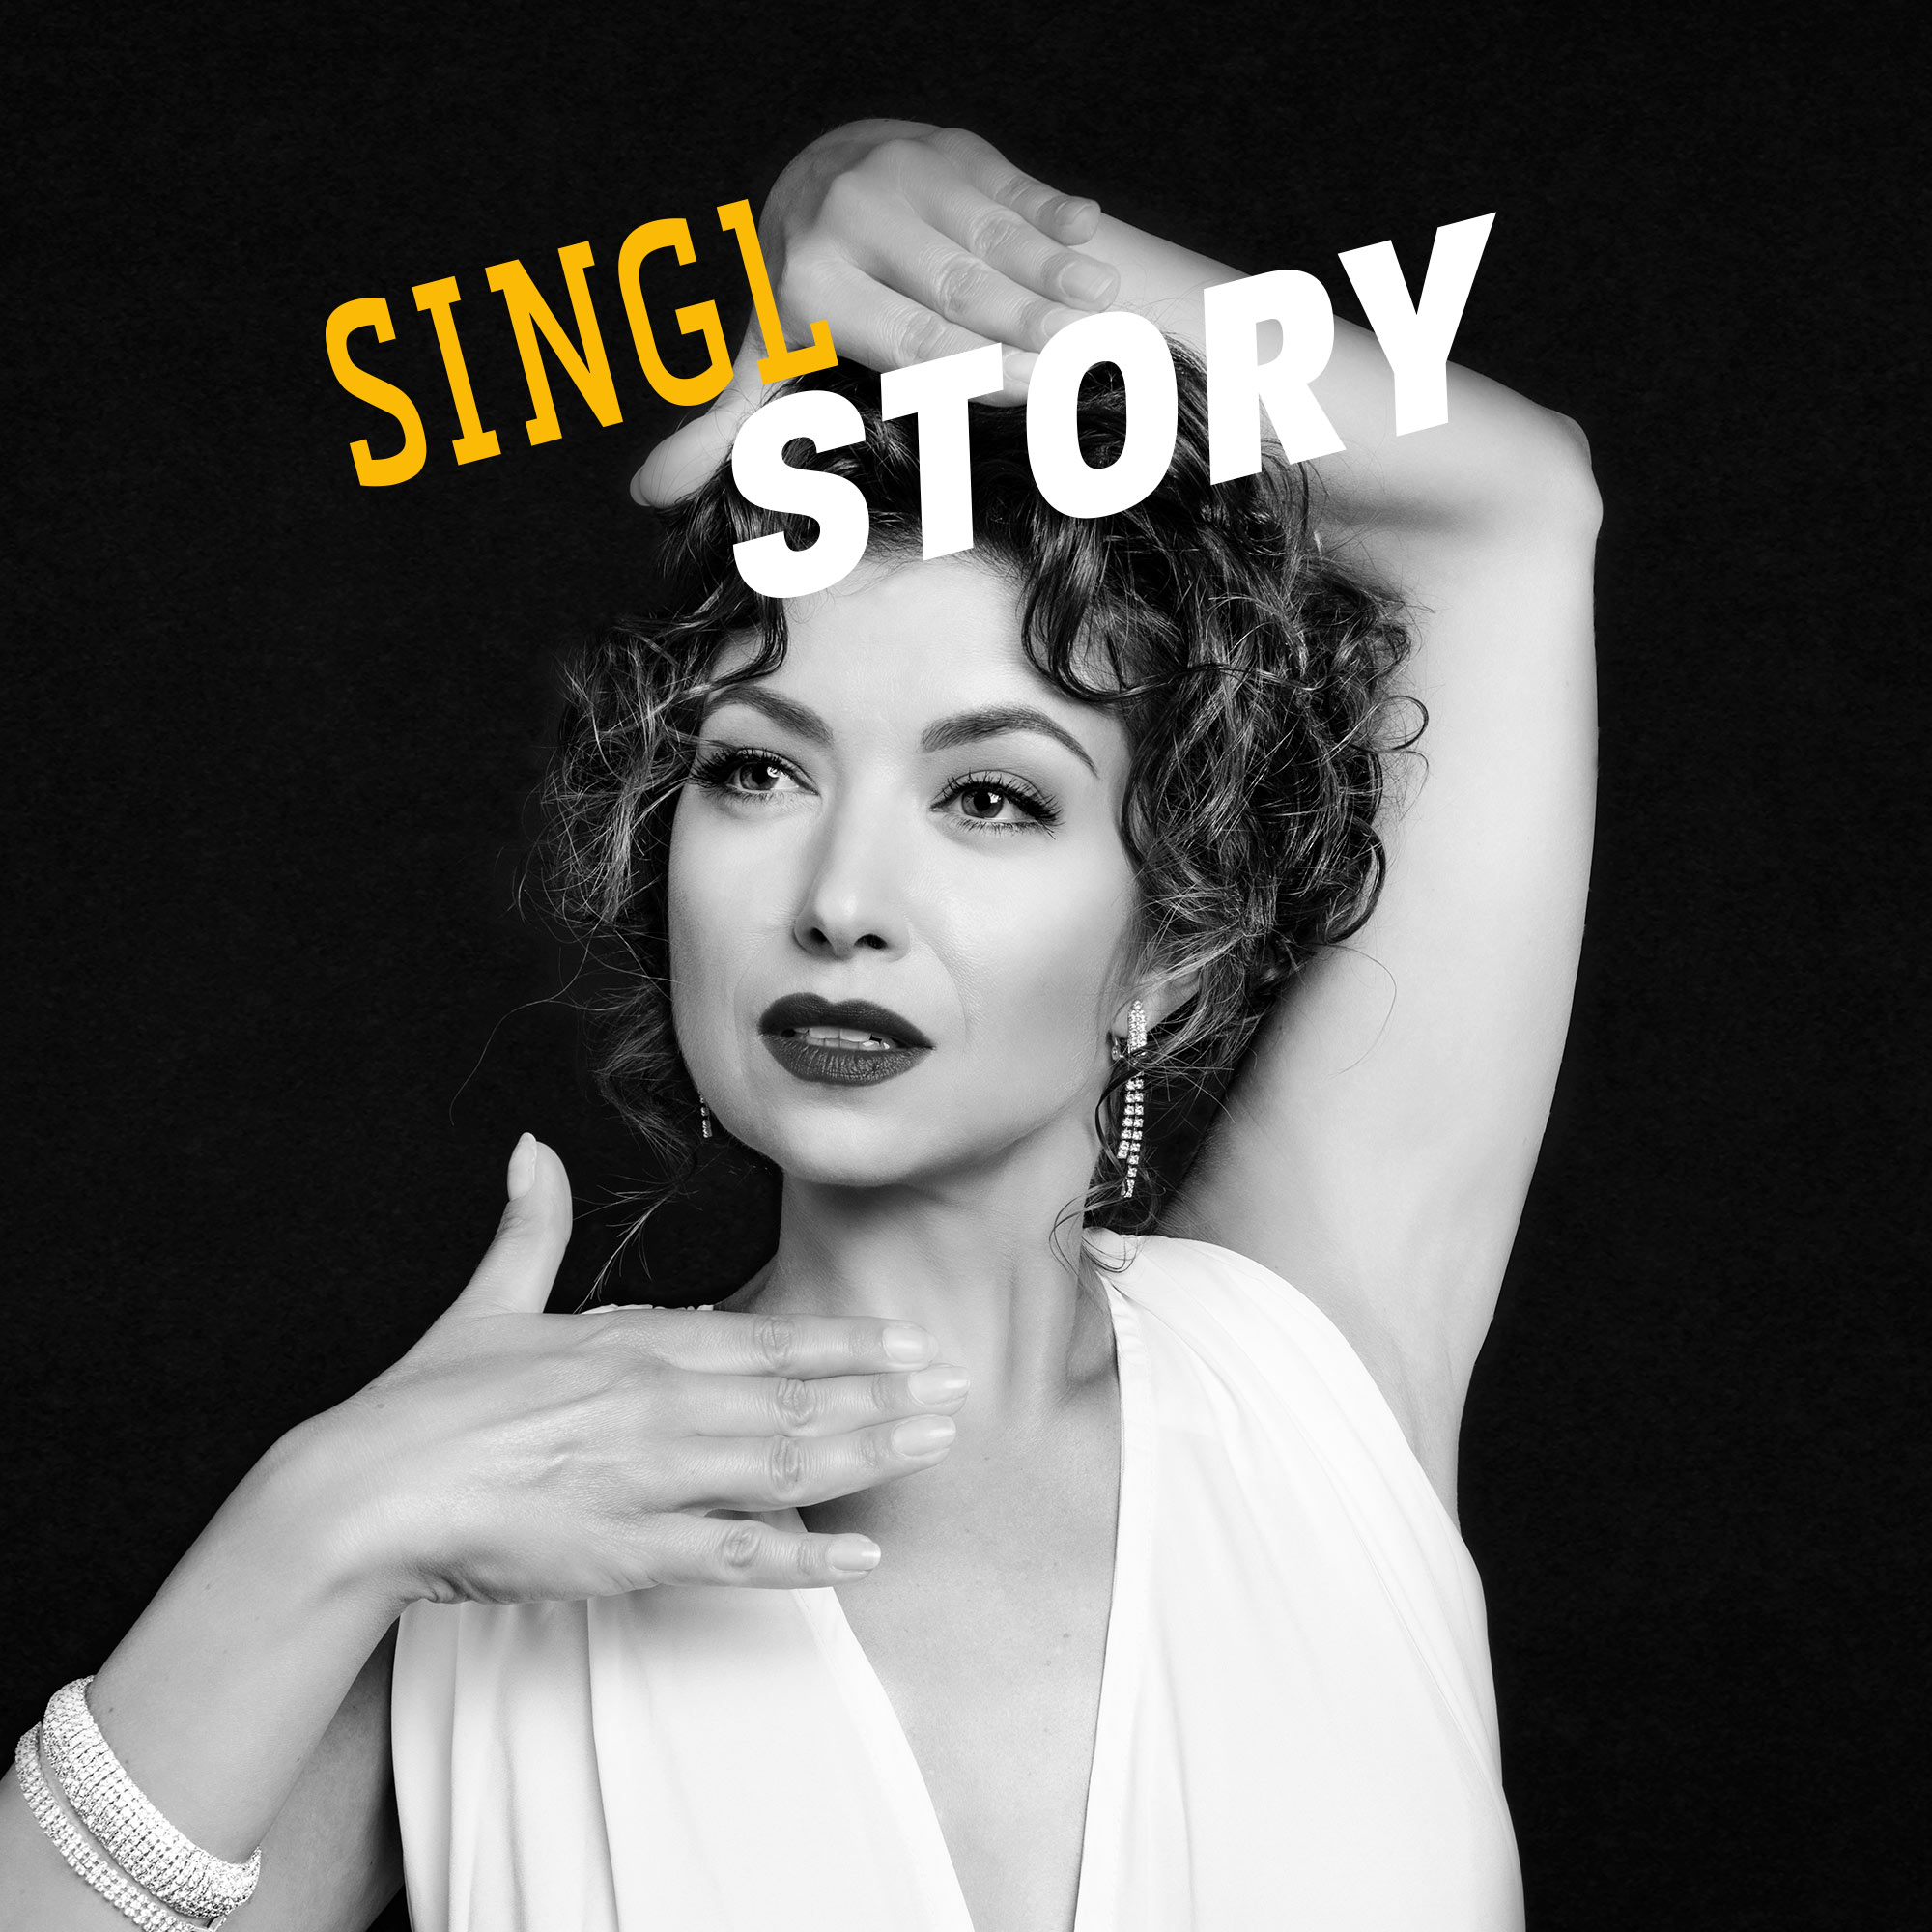 41. SinglStory